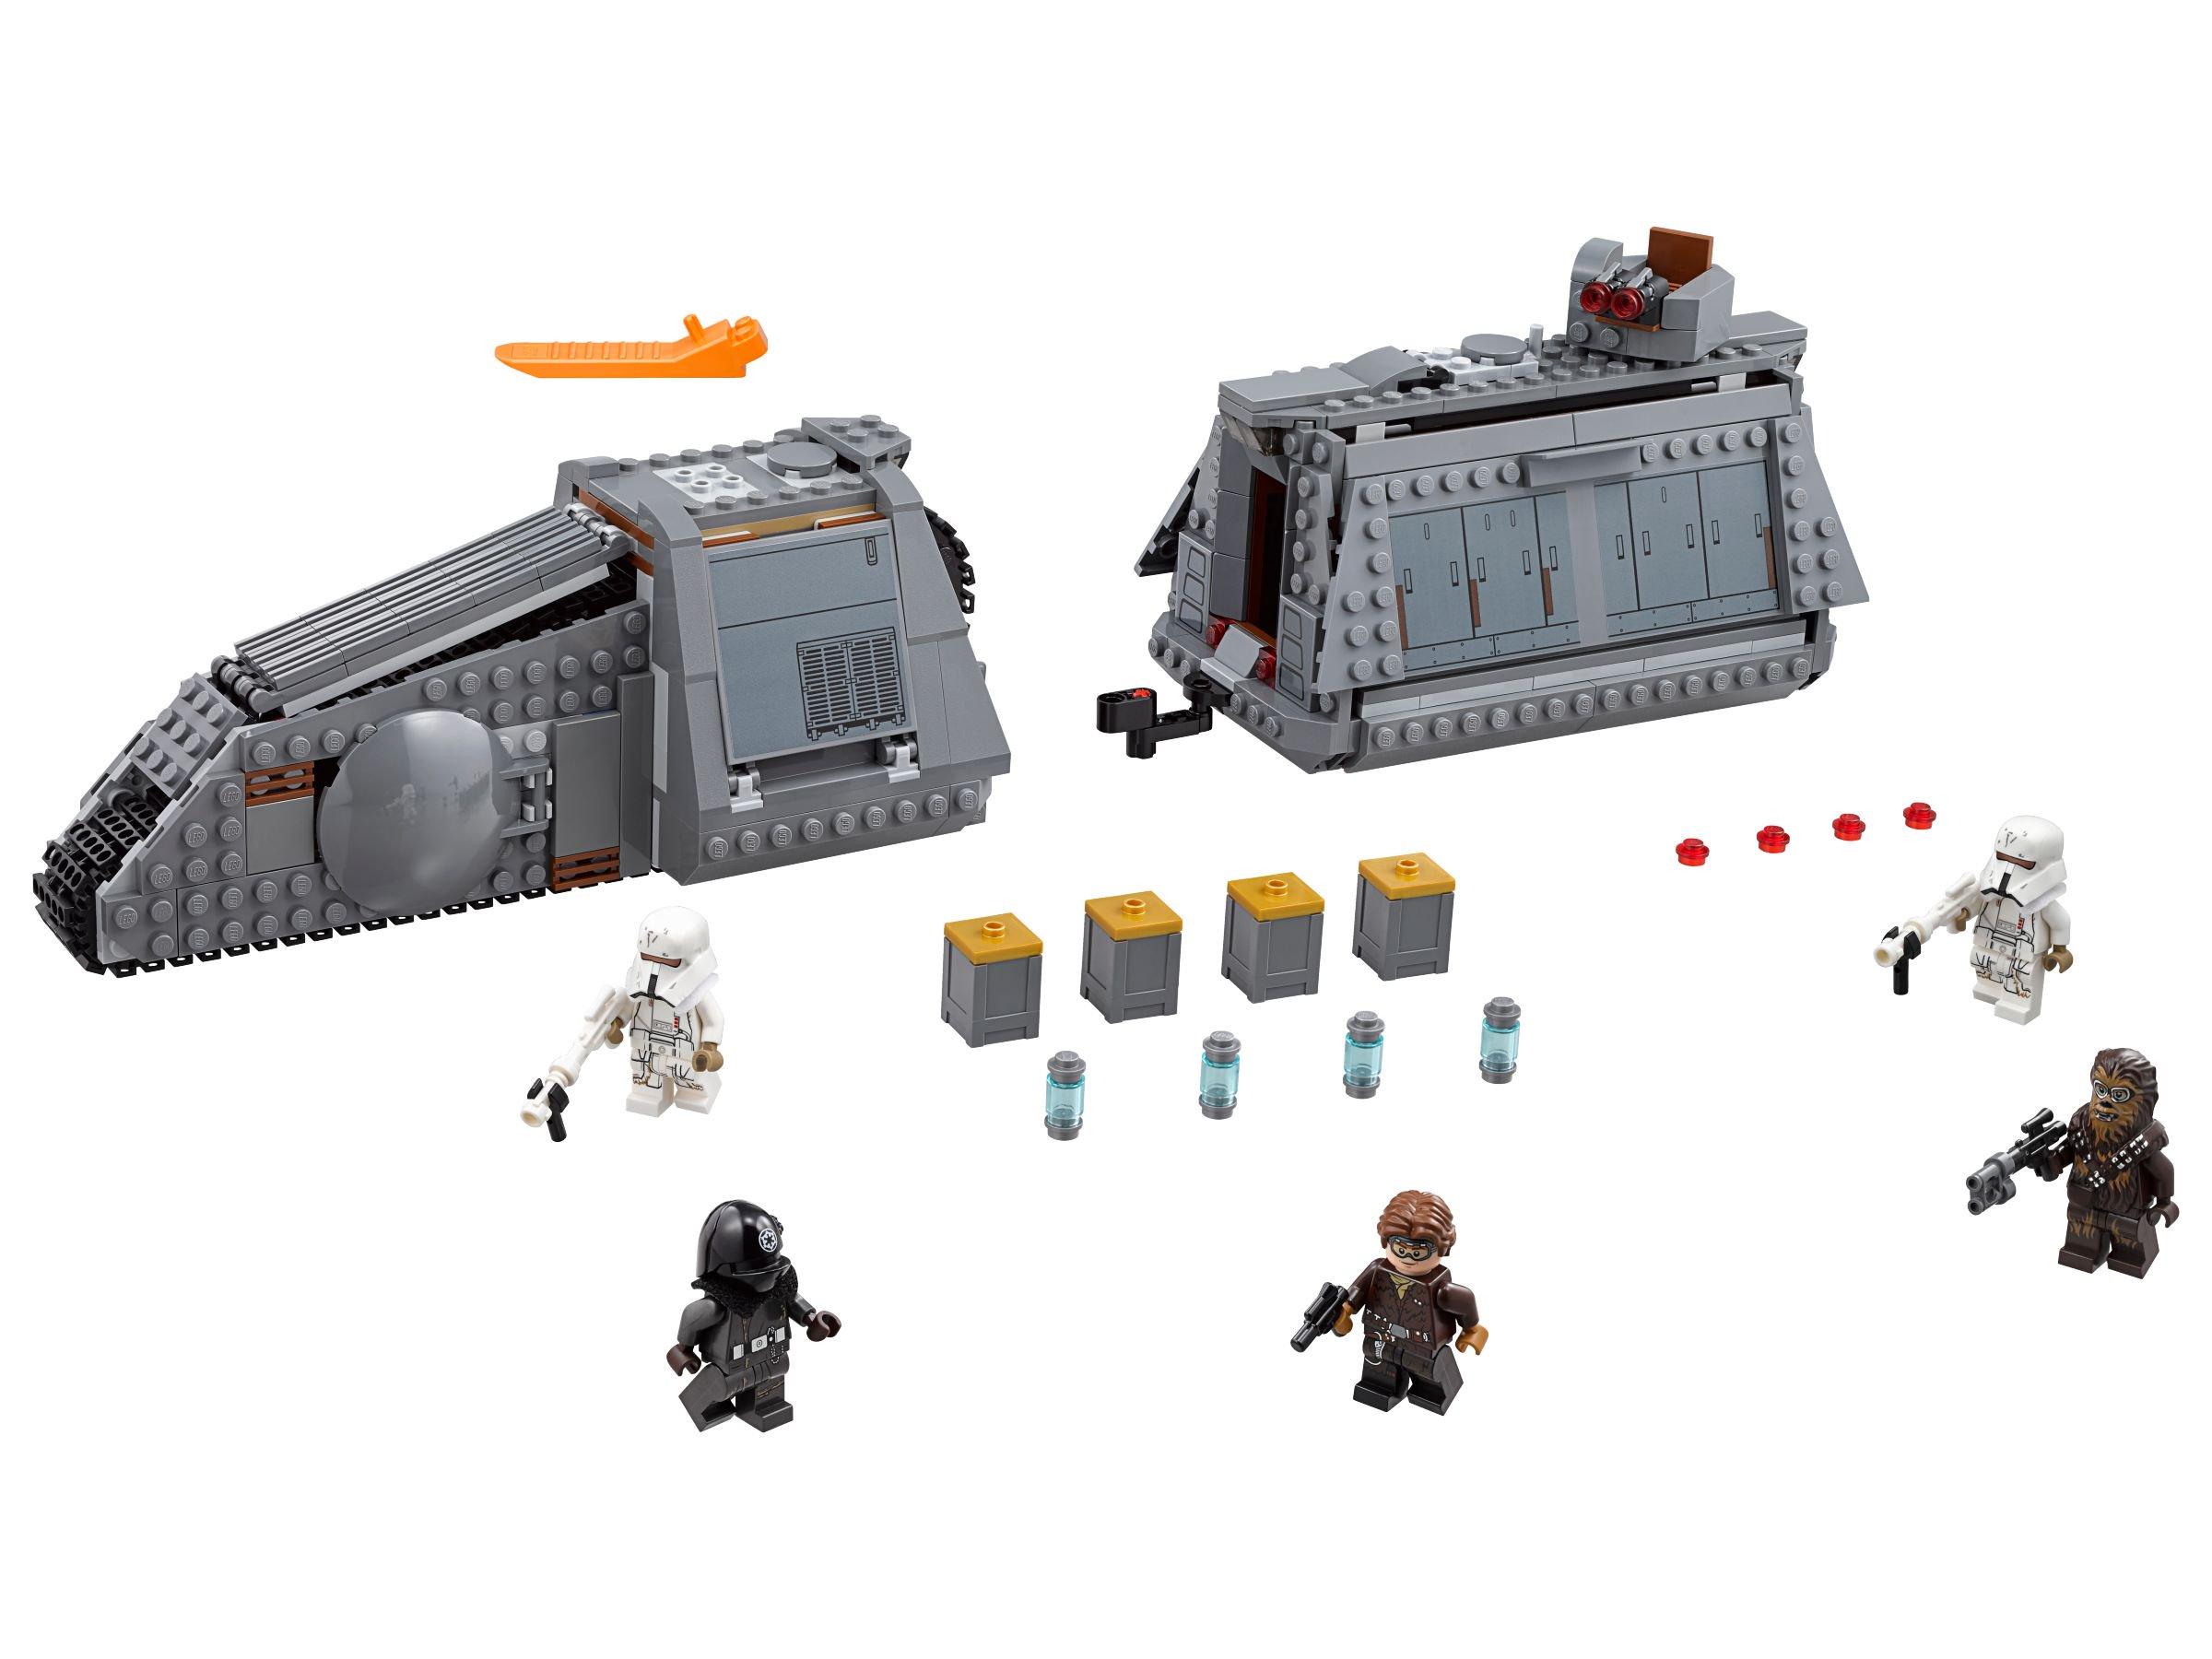 LEGO Star Wars - Imperial Conveyex Transport (75217) Amazon UK 48,20 Euro